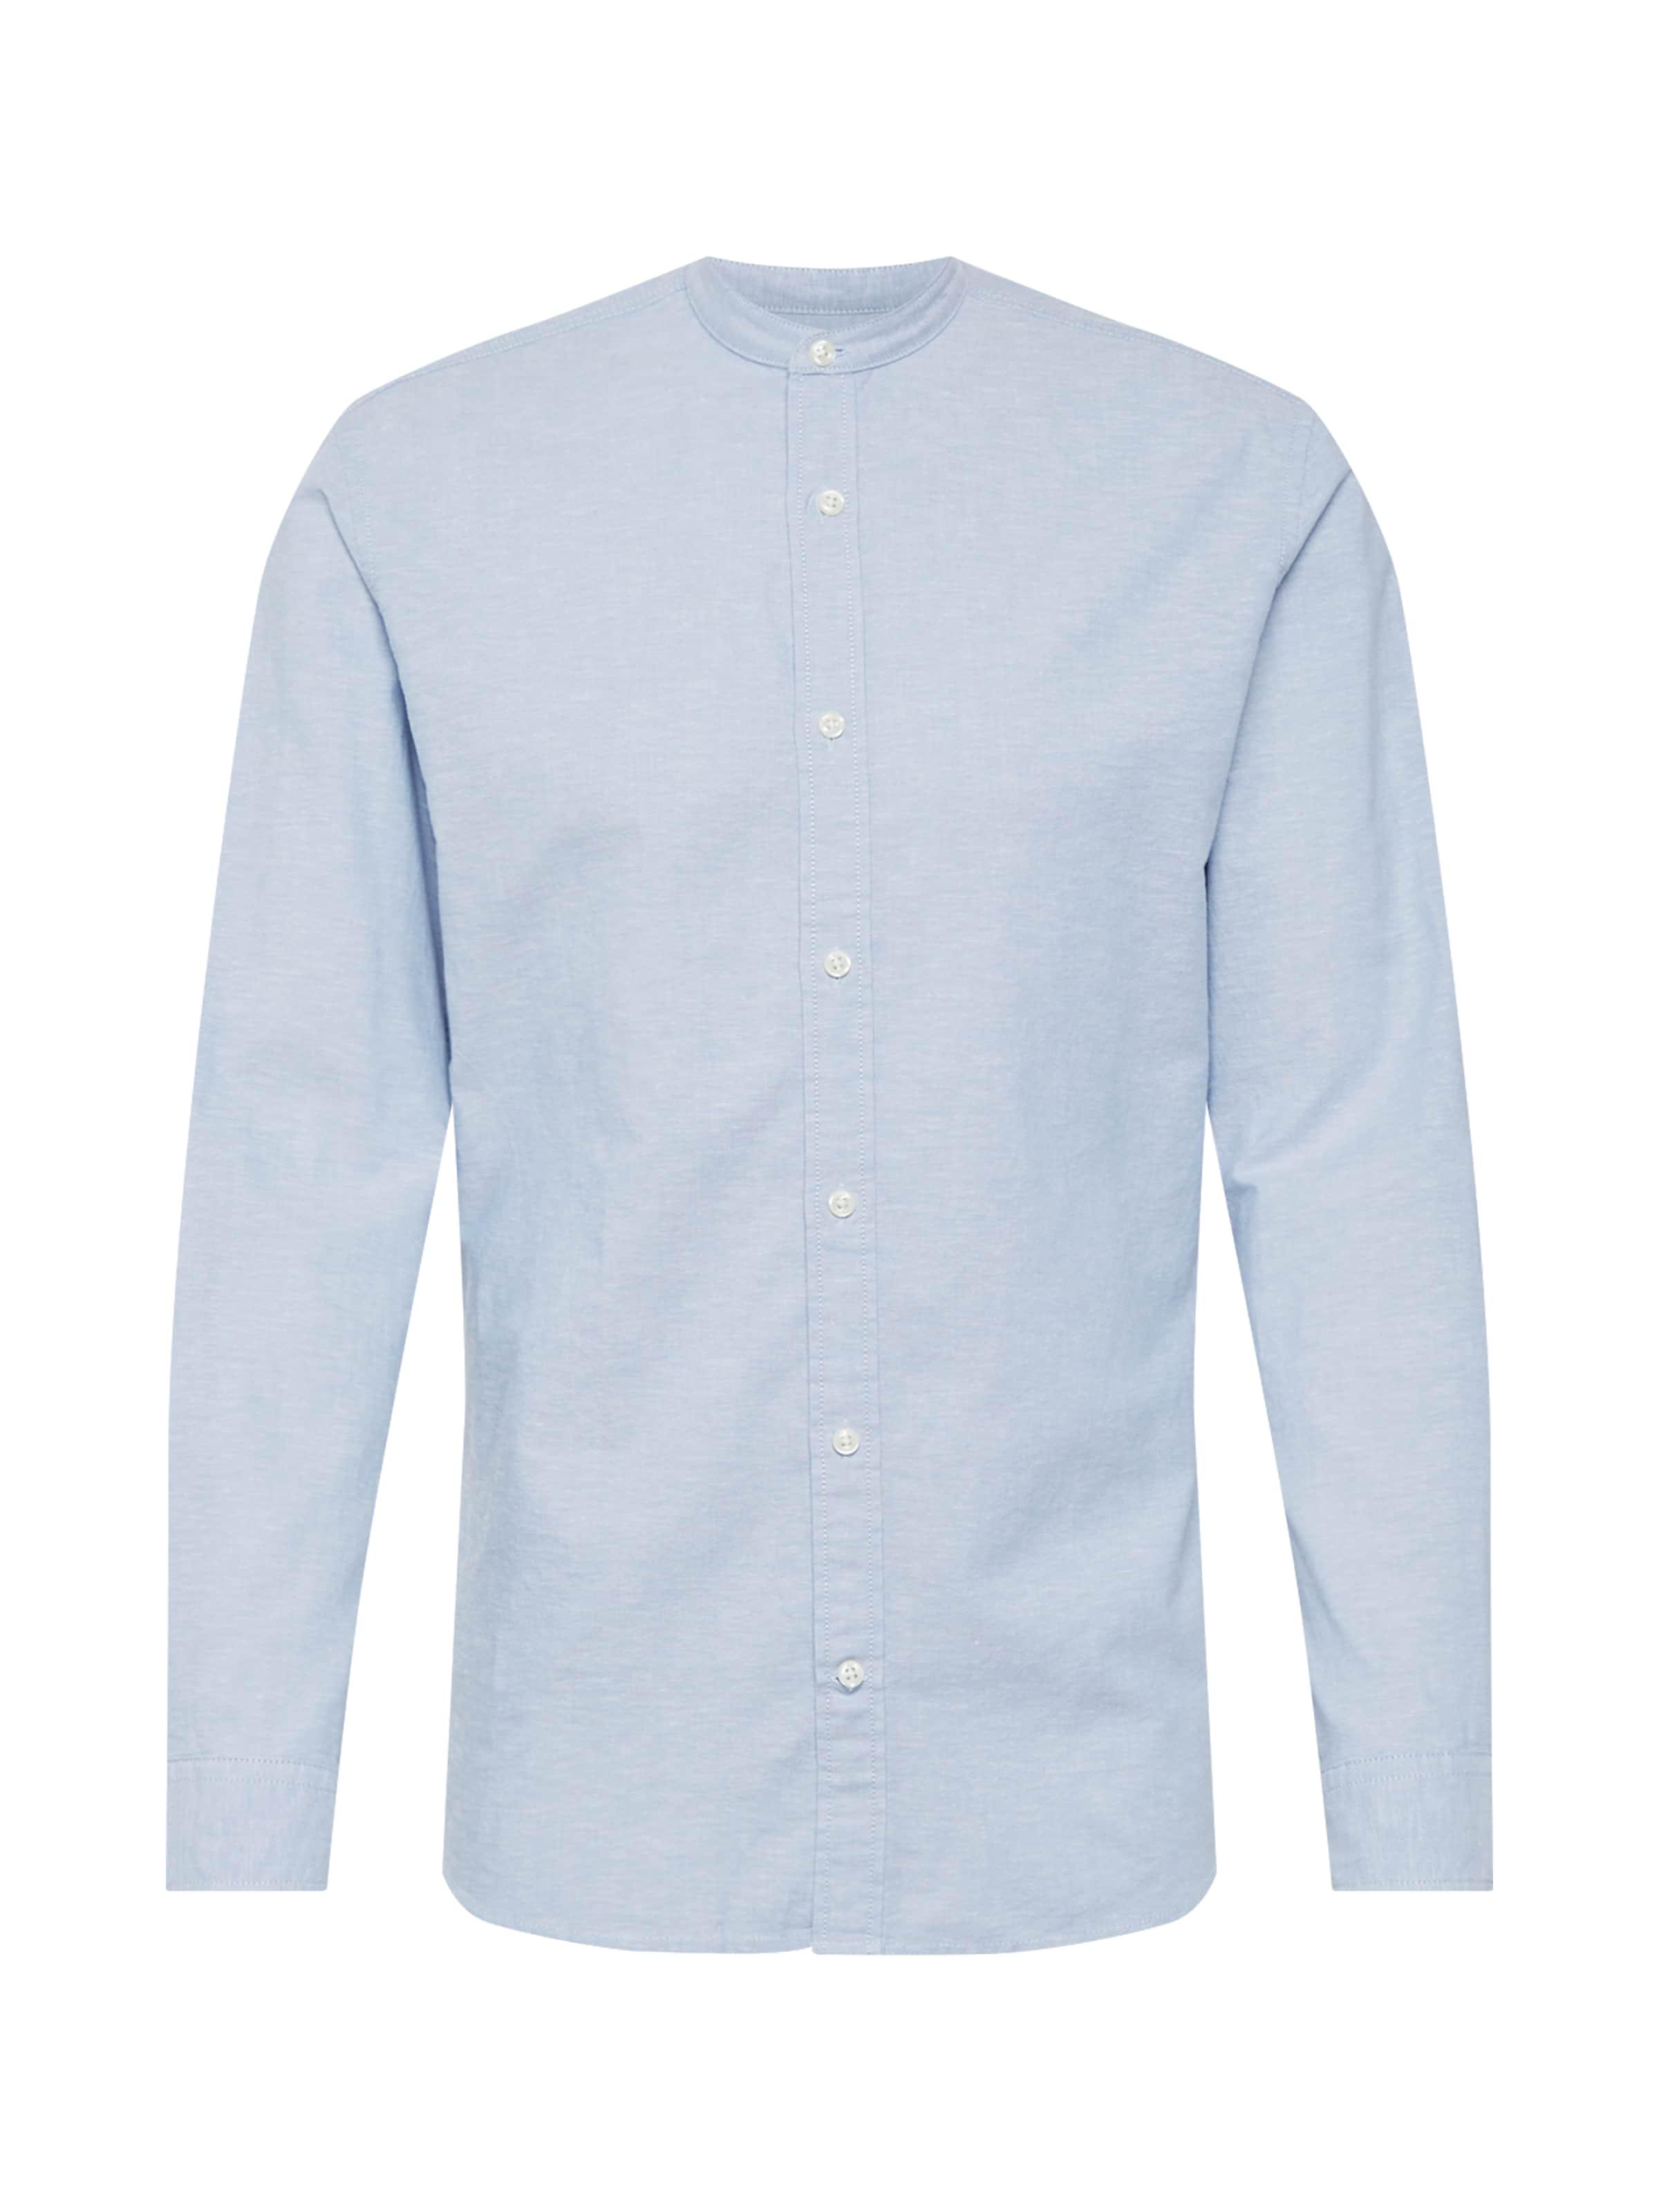 s Jackamp; Blanc Shirt Cassé Chemise 'jjesummer Noos' Jones L Band En 8nPOk0w